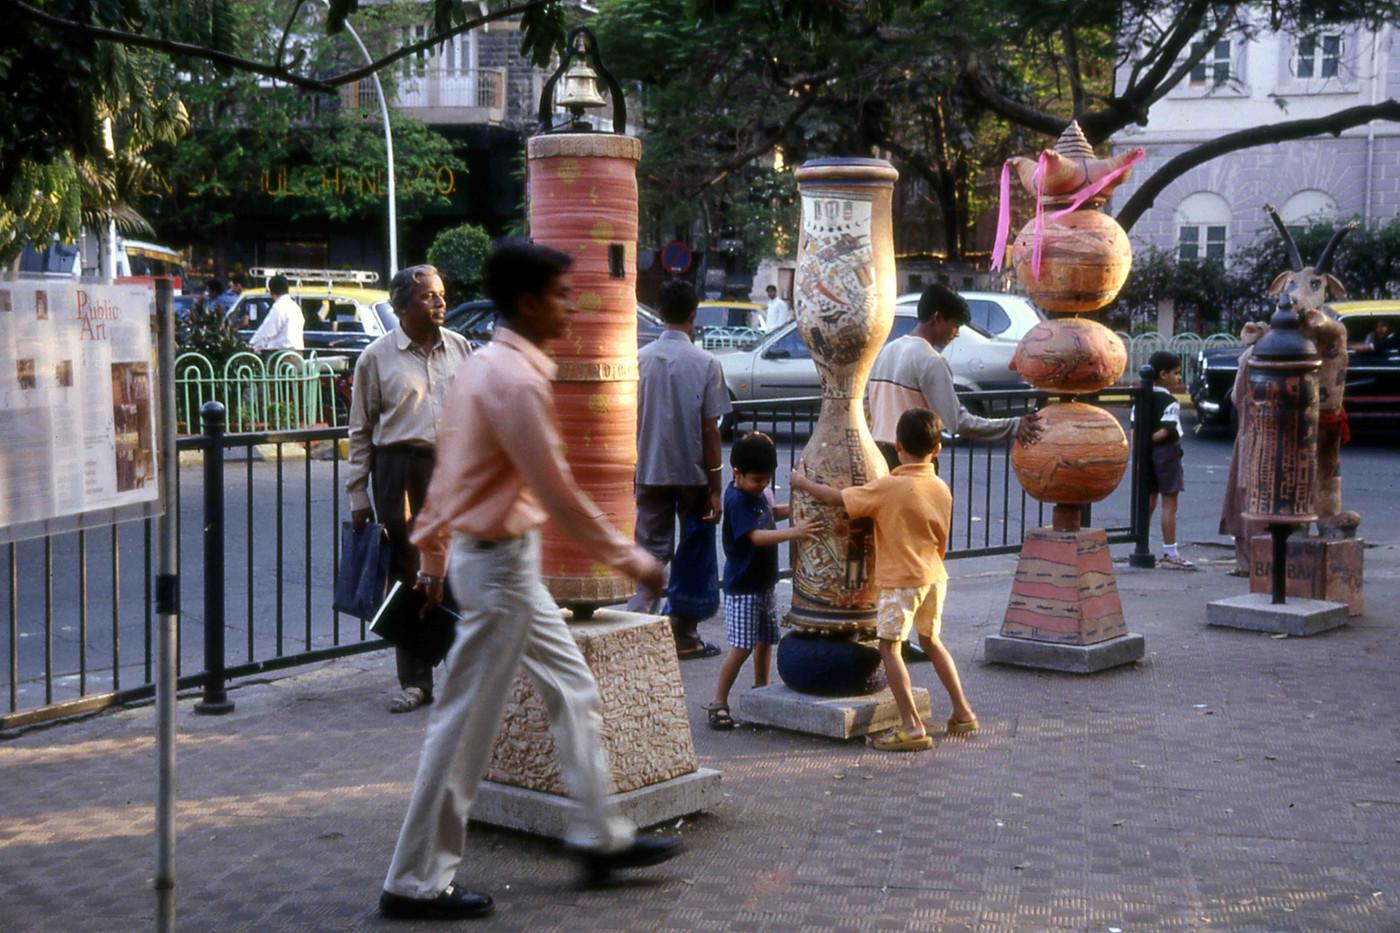 Interactive Public Art